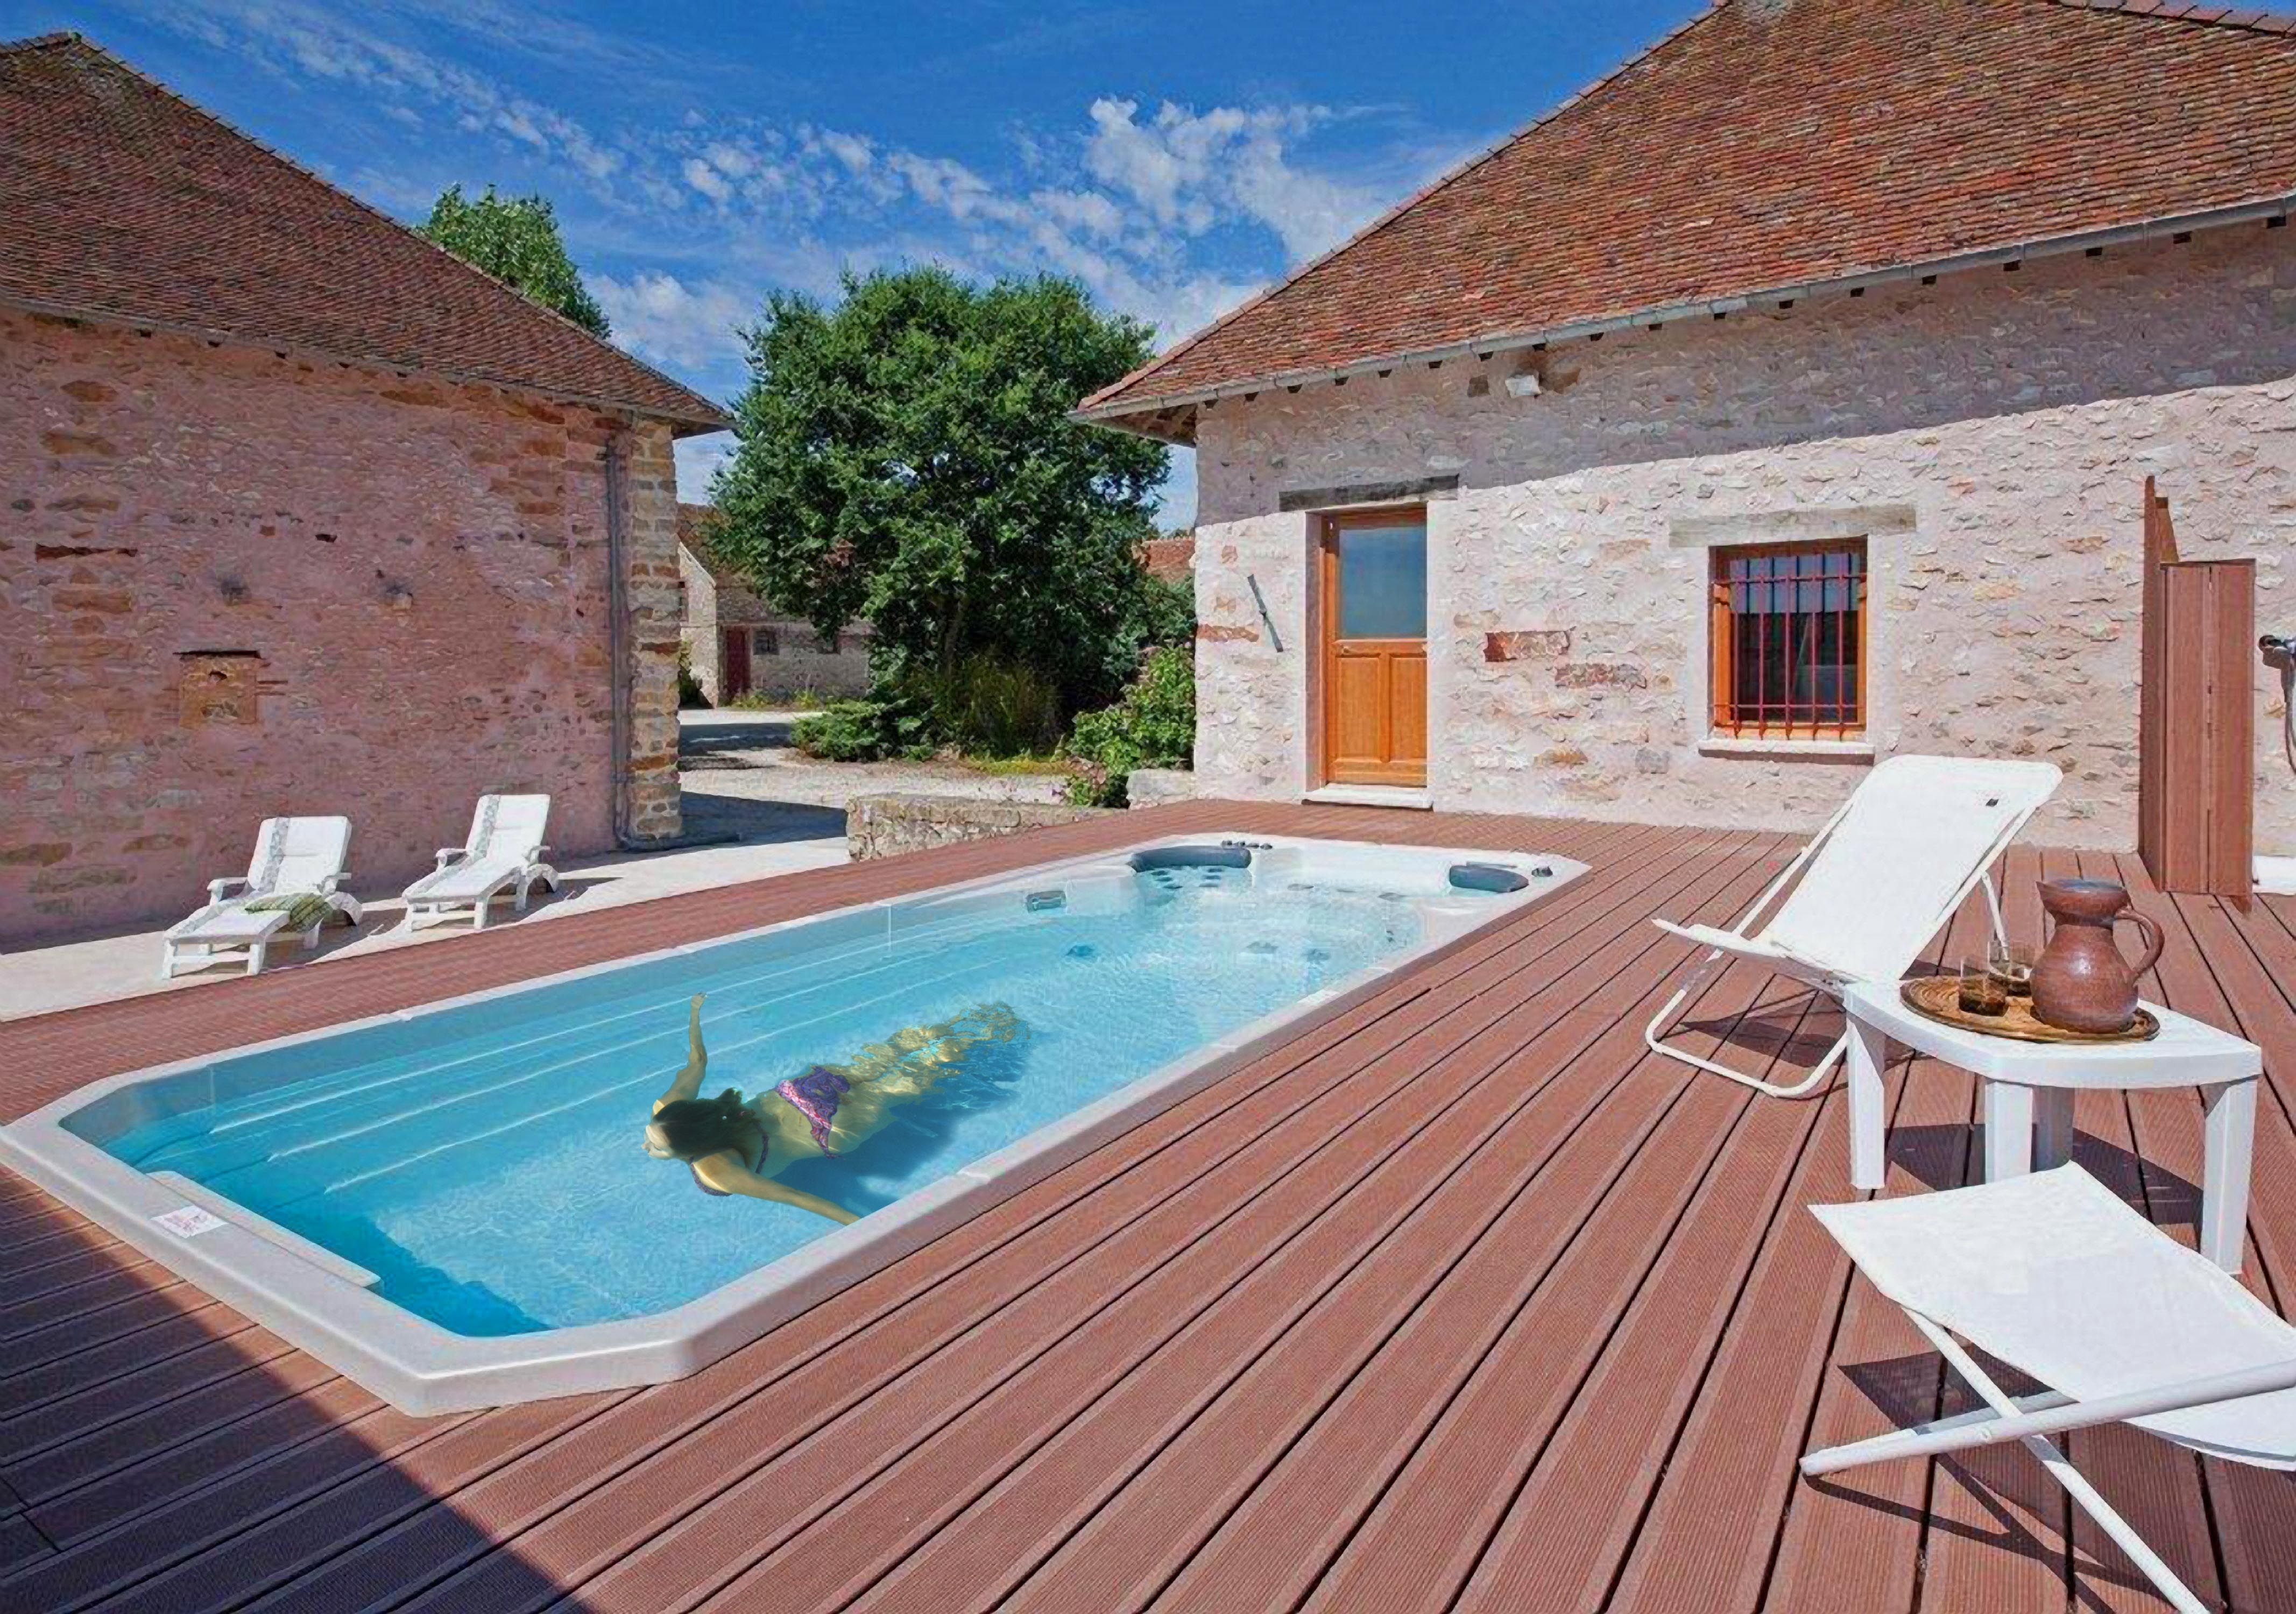 hydropool-nottingham-midlands-swim-spa-pool-swimming